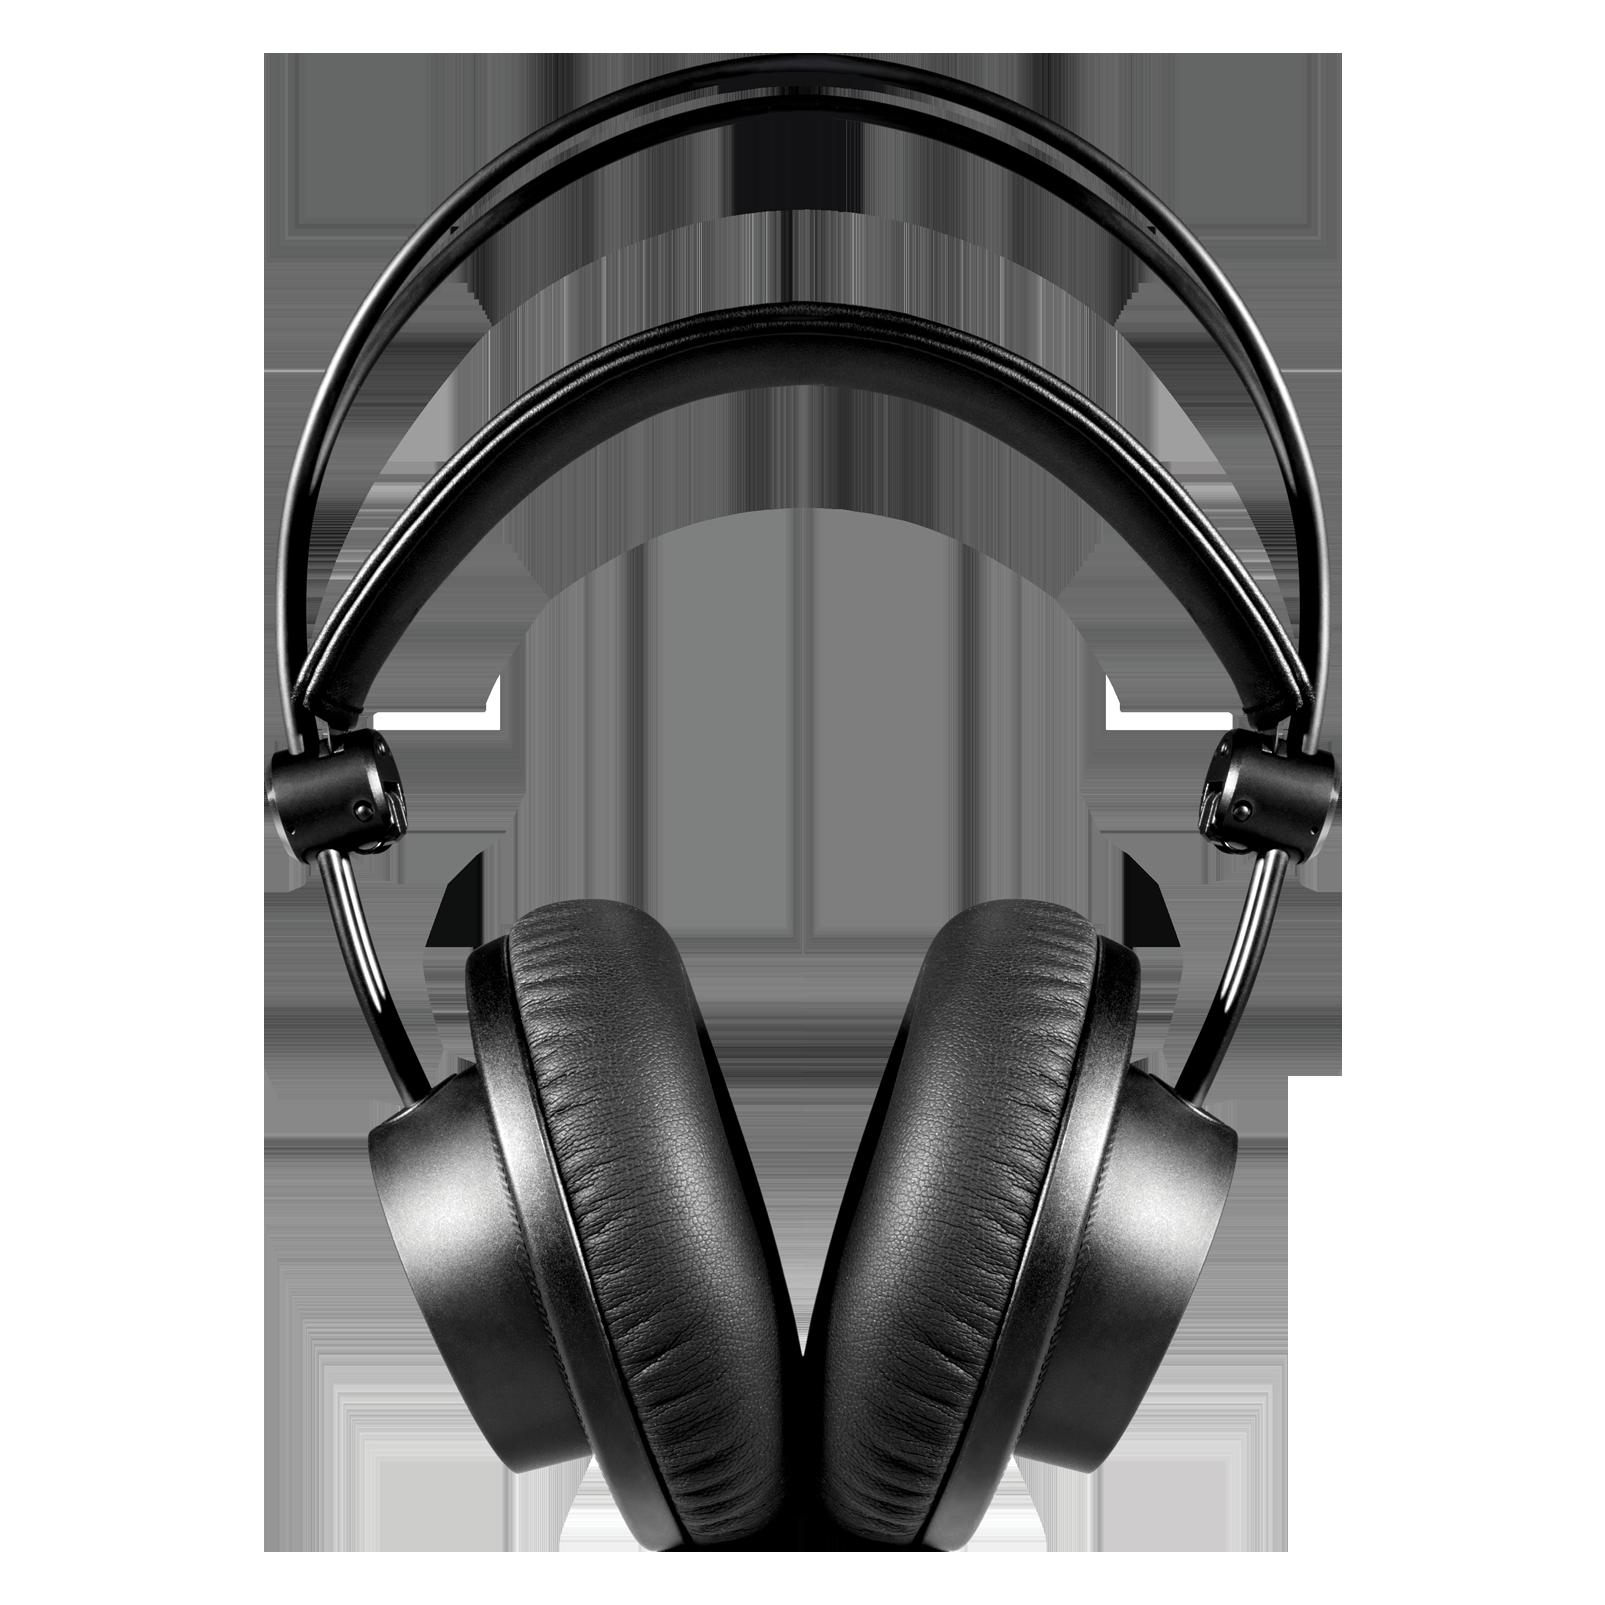 K275 - Black - Over-ear, closed-back, foldable studio headphones - Front